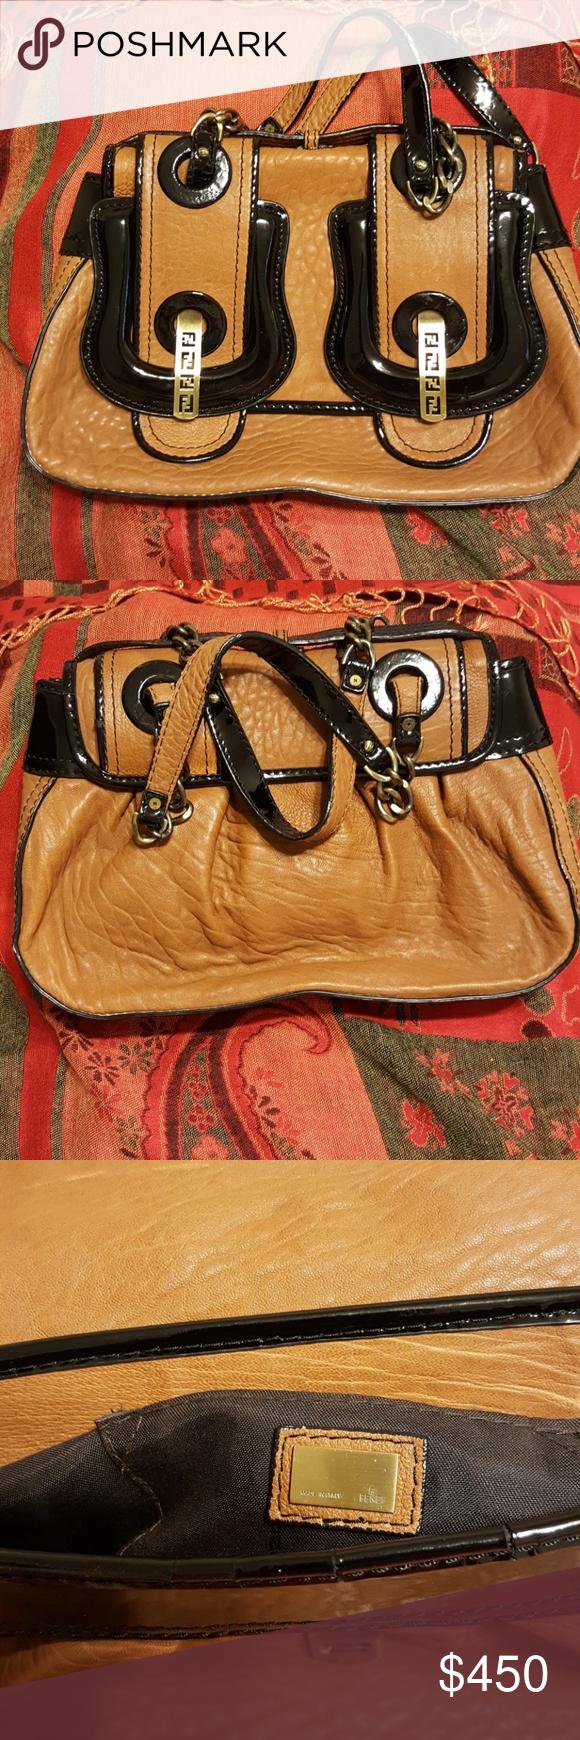 free shipping fendi handbag authenticity code 18f5a 739f4 8874fddd7d